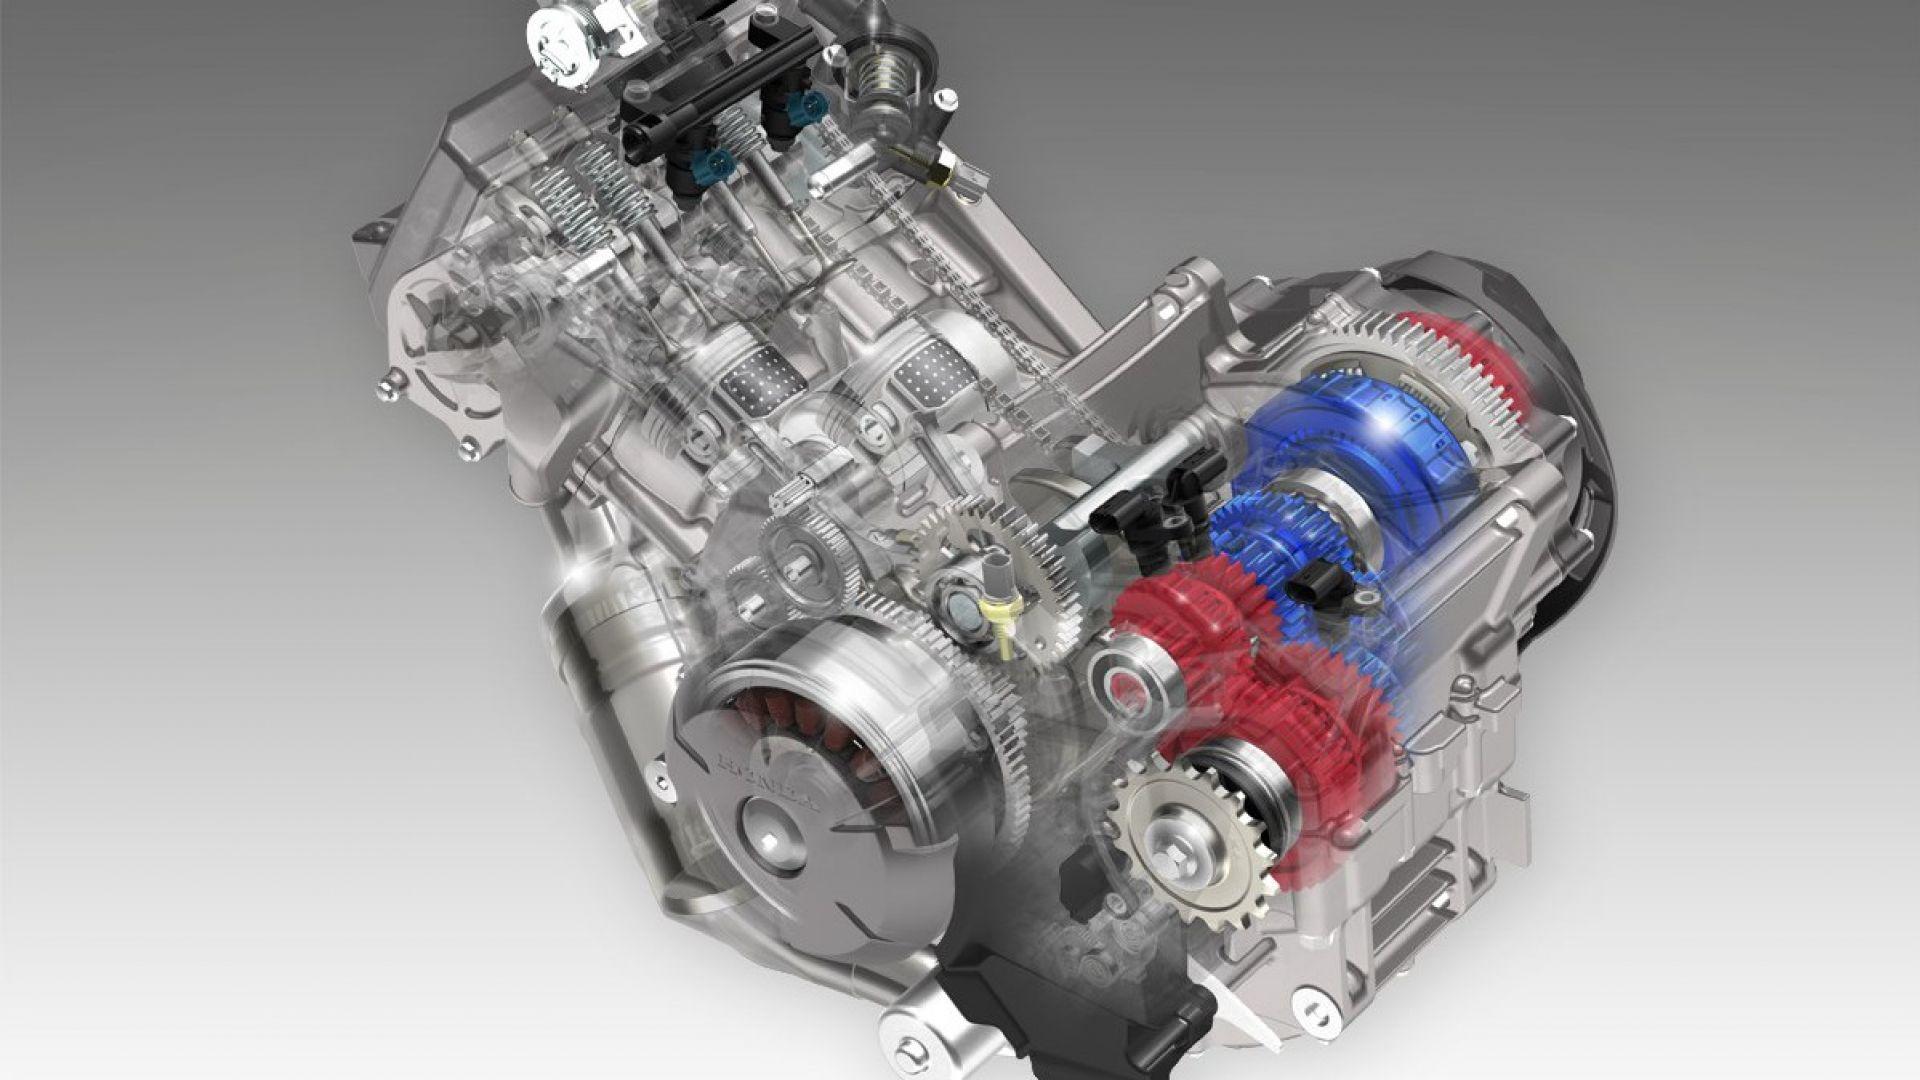 News Honda Online Un Sito Dedicato Al Cambio Dct Motorbox